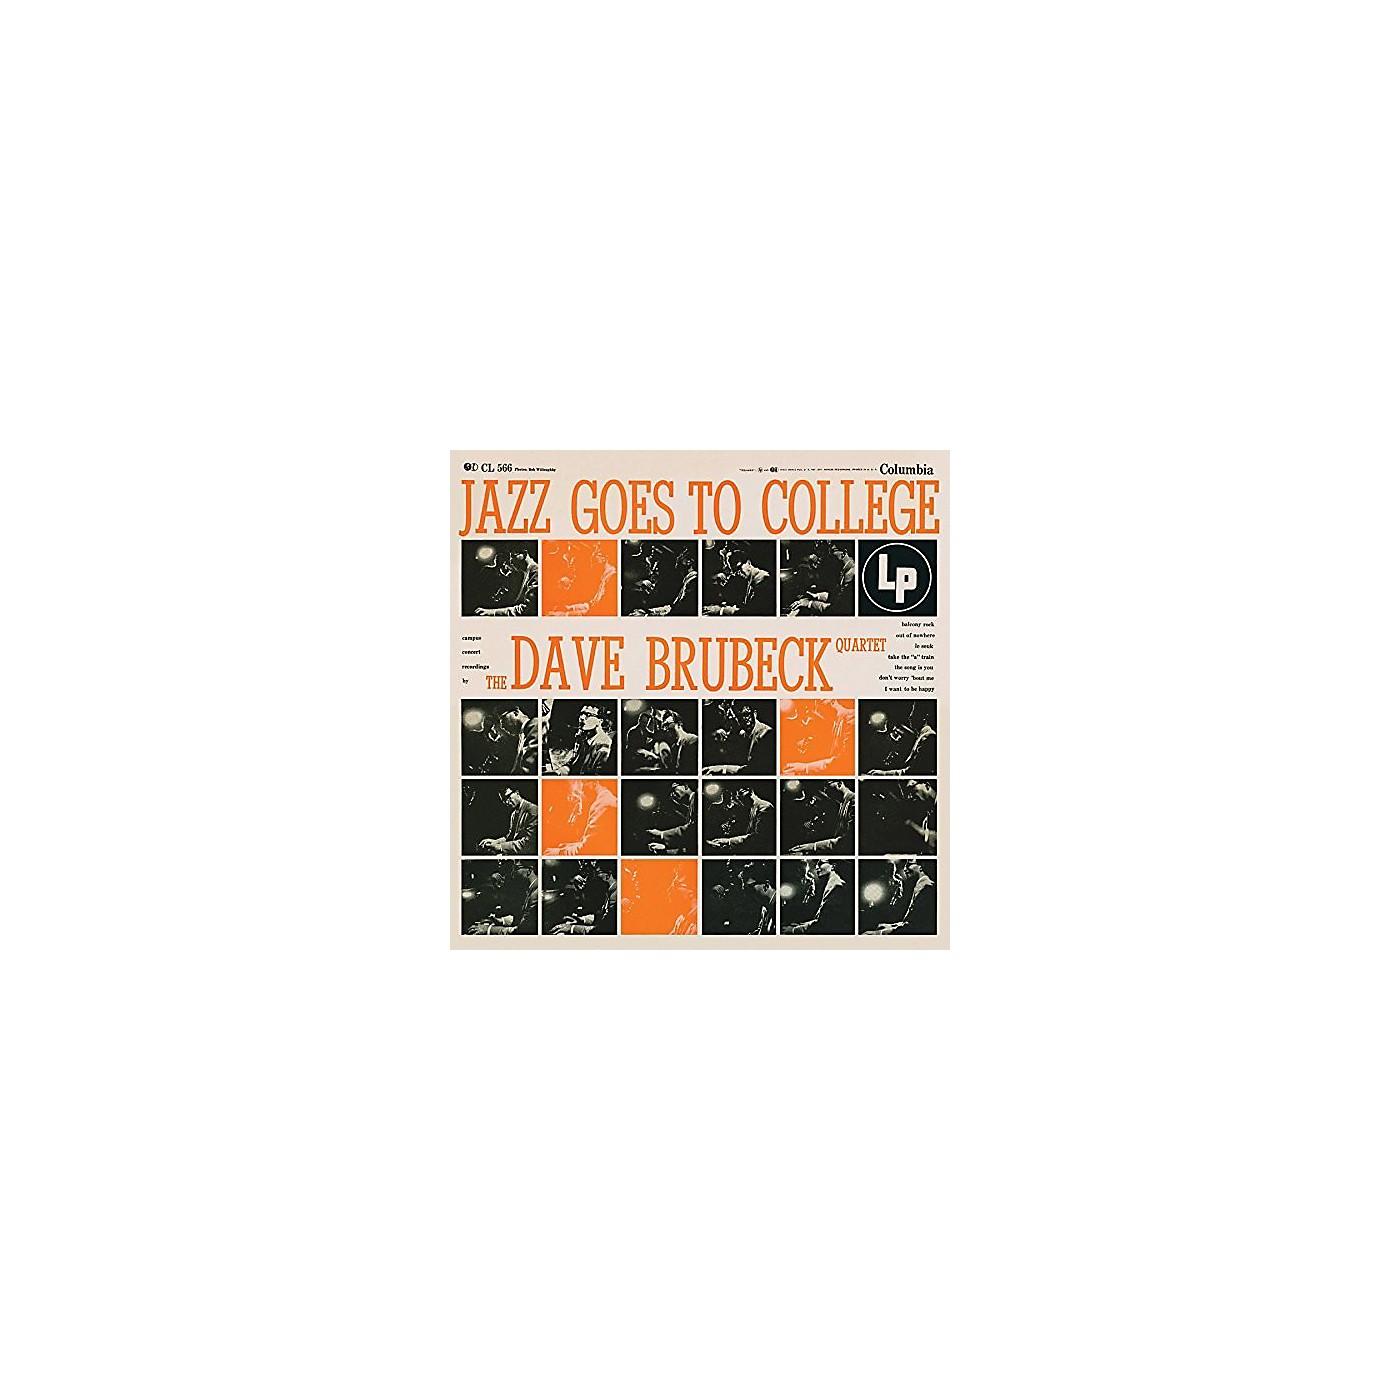 Alliance Dave Brubeck Quartet Jazz - Jazz Goes to College thumbnail